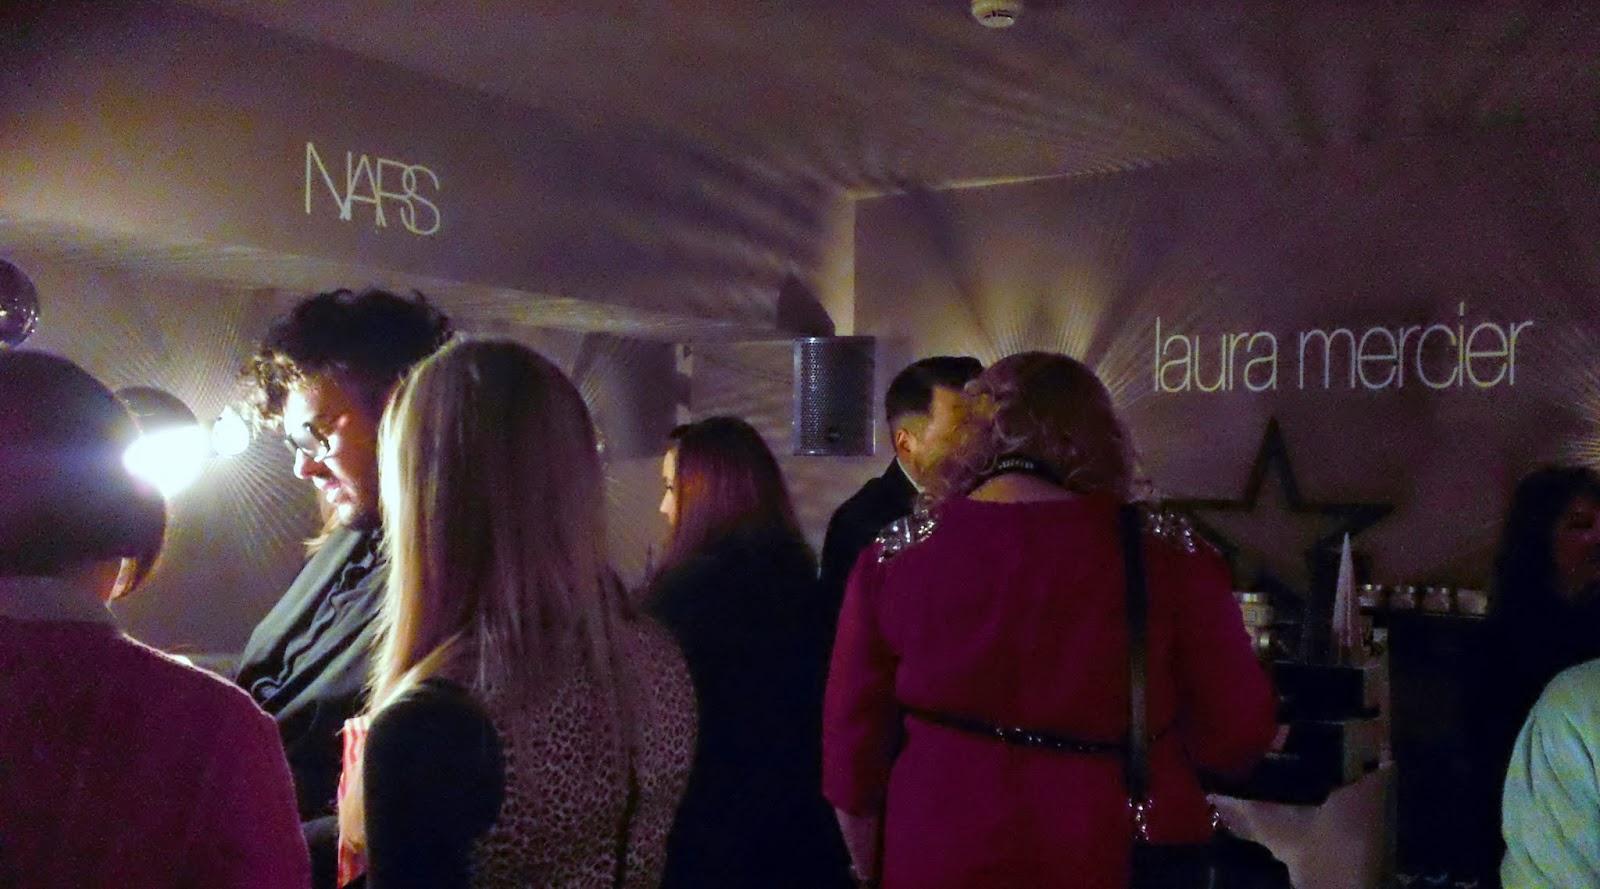 John Lewis Press Event, John Lewis Christmas, Kuku Club, Park Plaza Hotel Cardiff, Laura Mercier, NARS